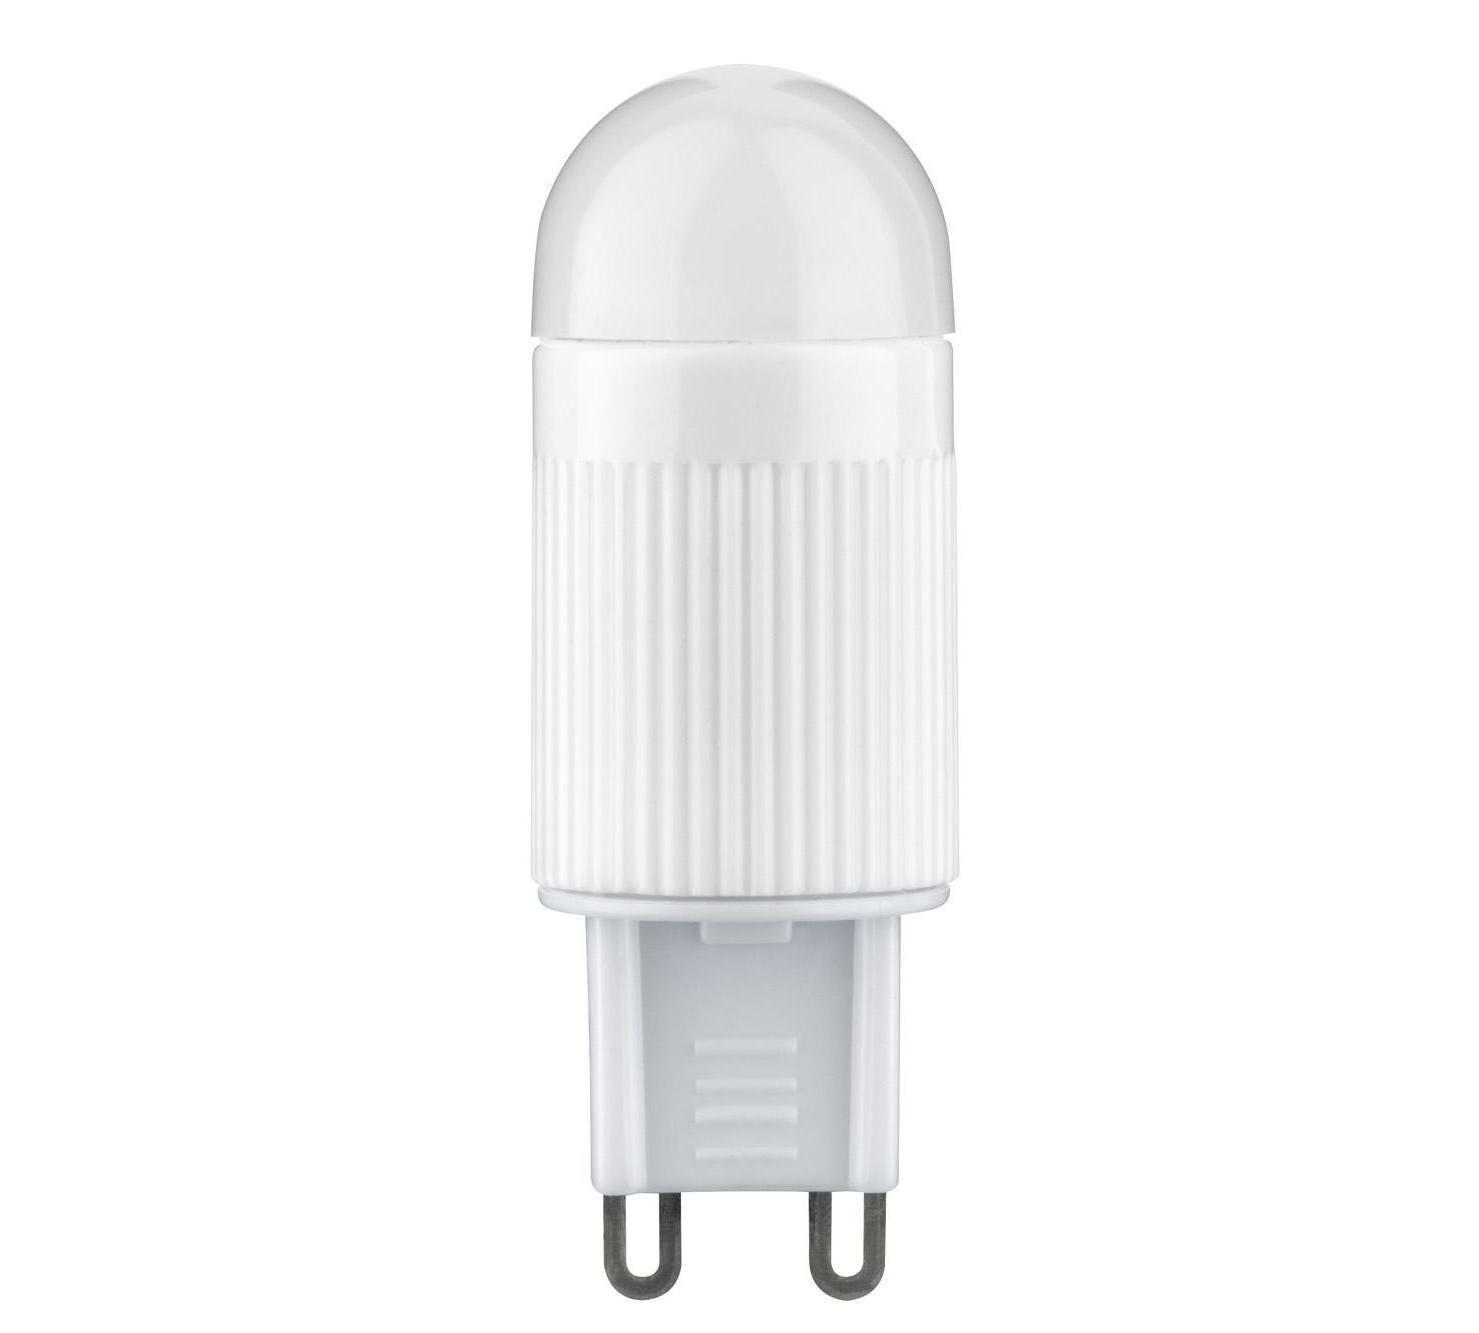 PAULMANN P 28290 led žárovka G9 2x2,4W 80-89 Ra